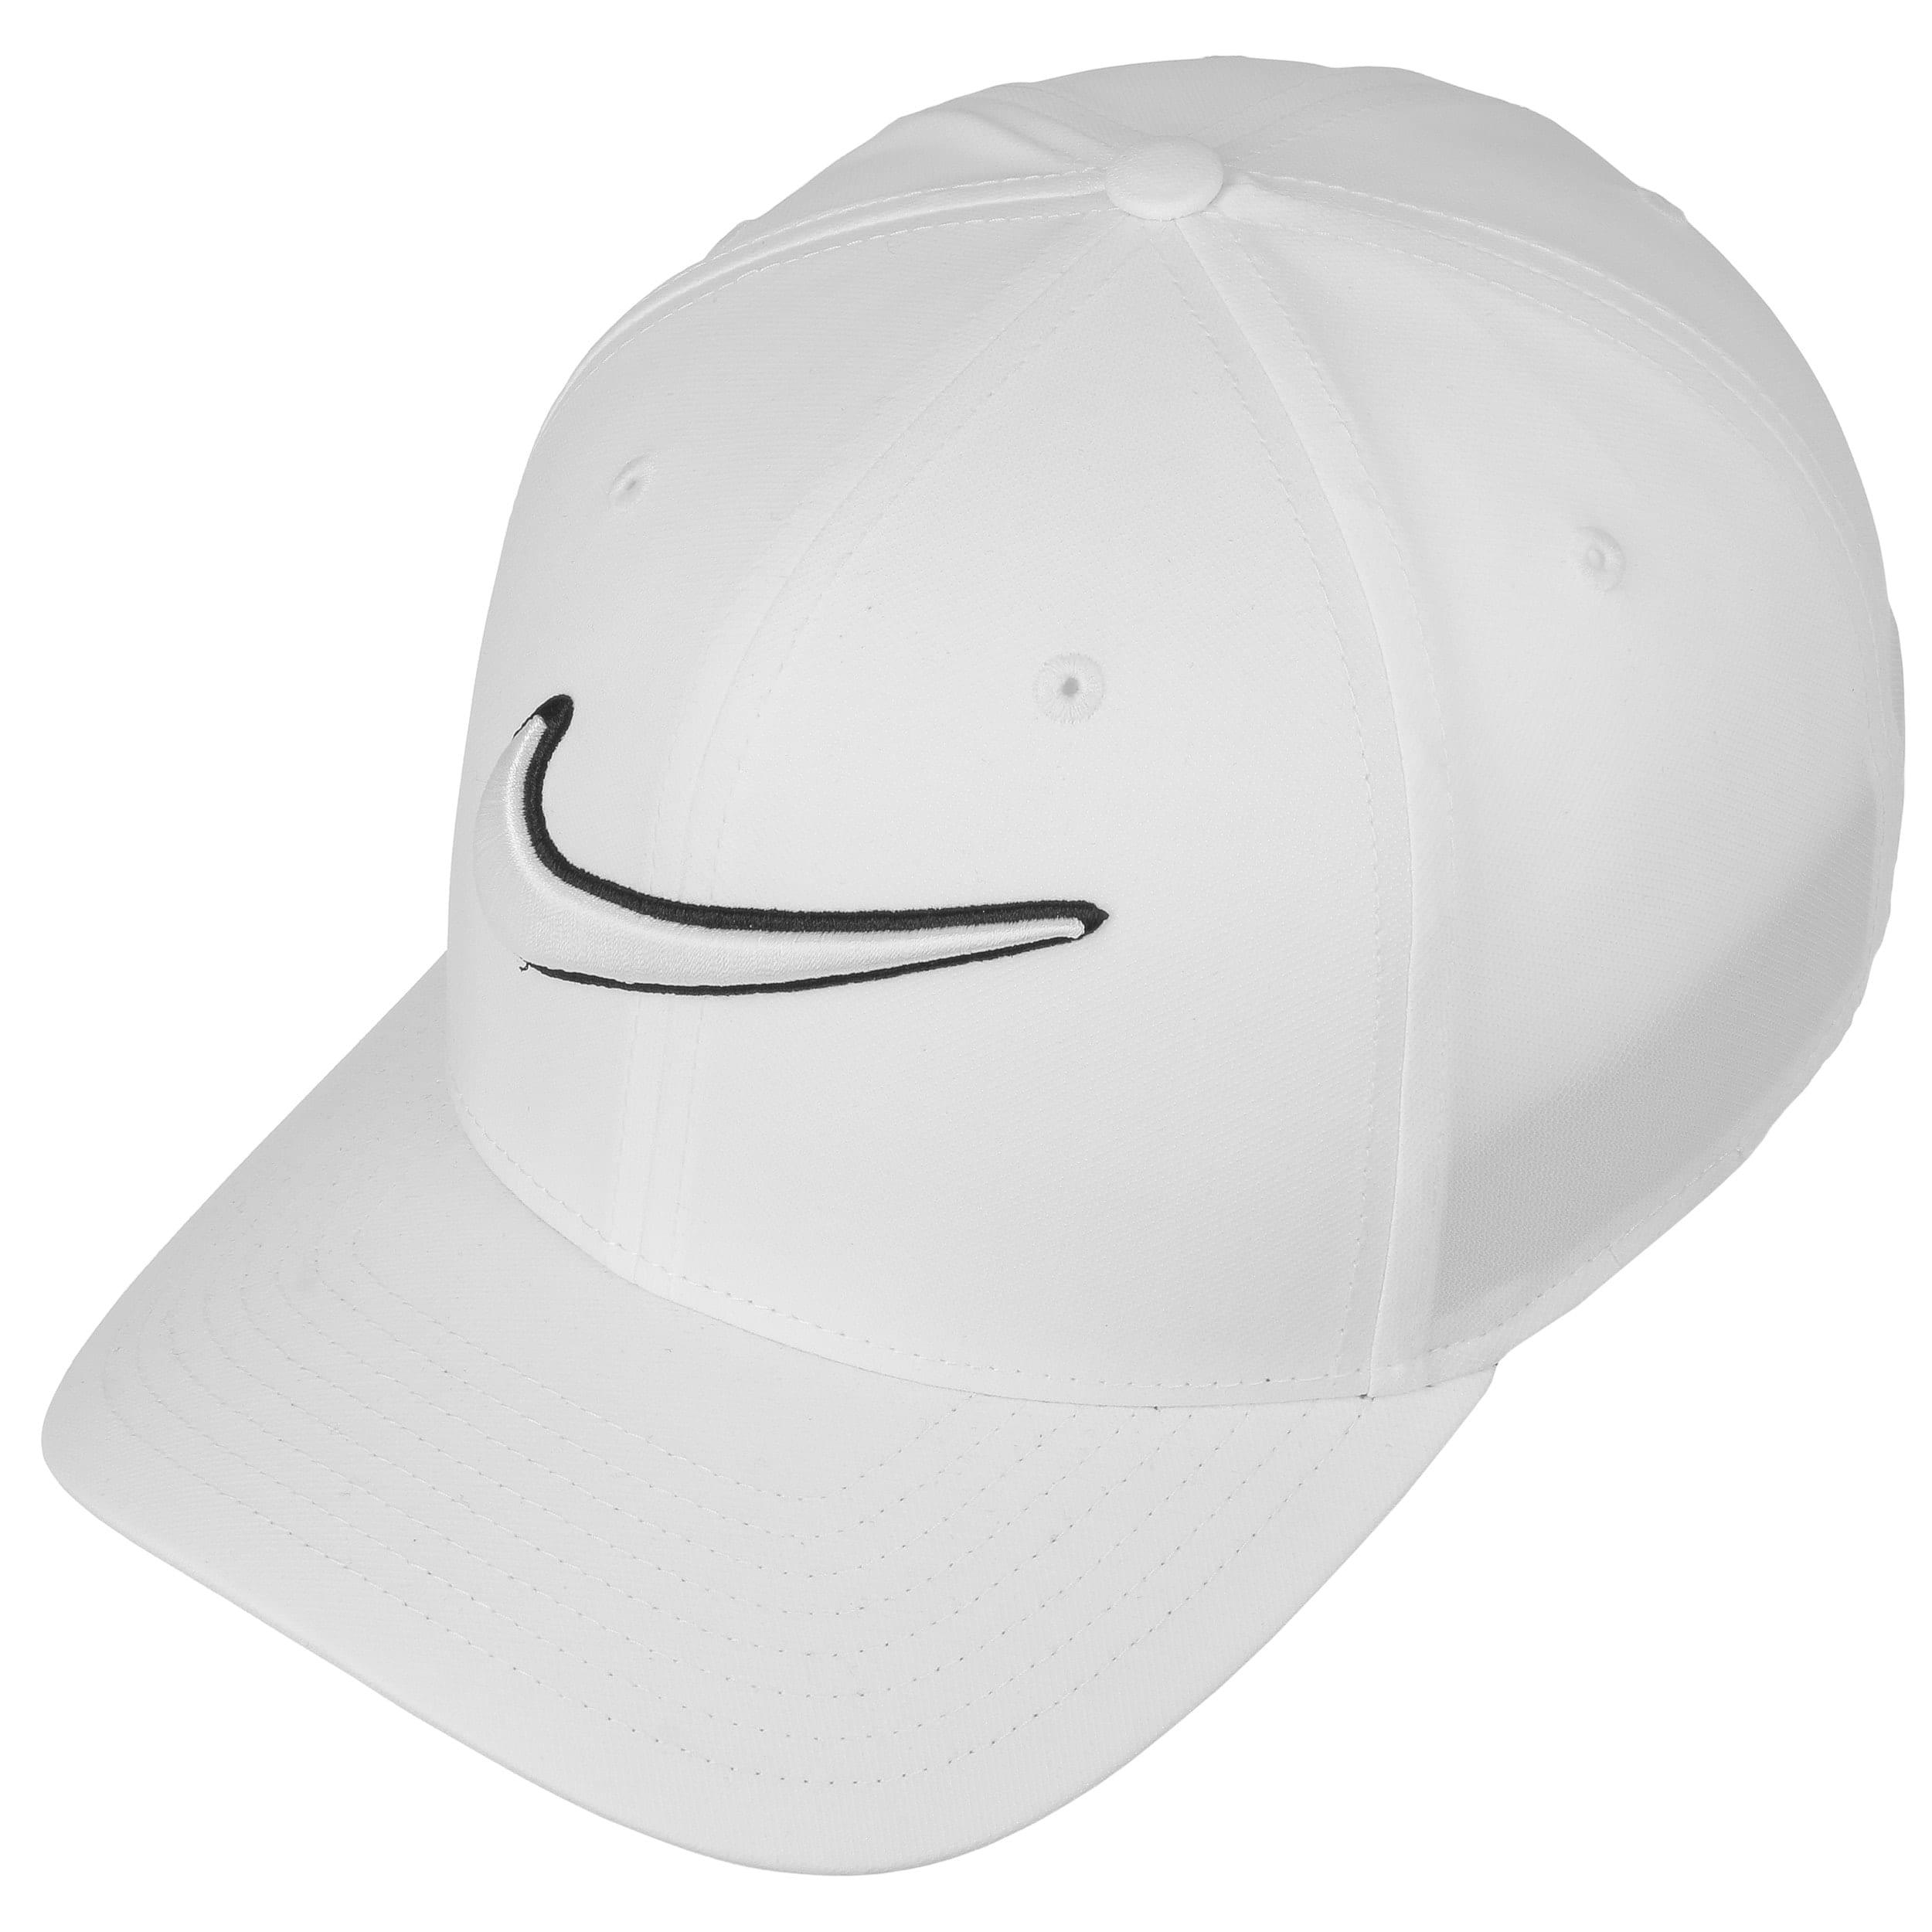 e8fb9b3a72c52 Gorra Golf Classic 99 Performance by Nike - Gorras - sombreroshop.es